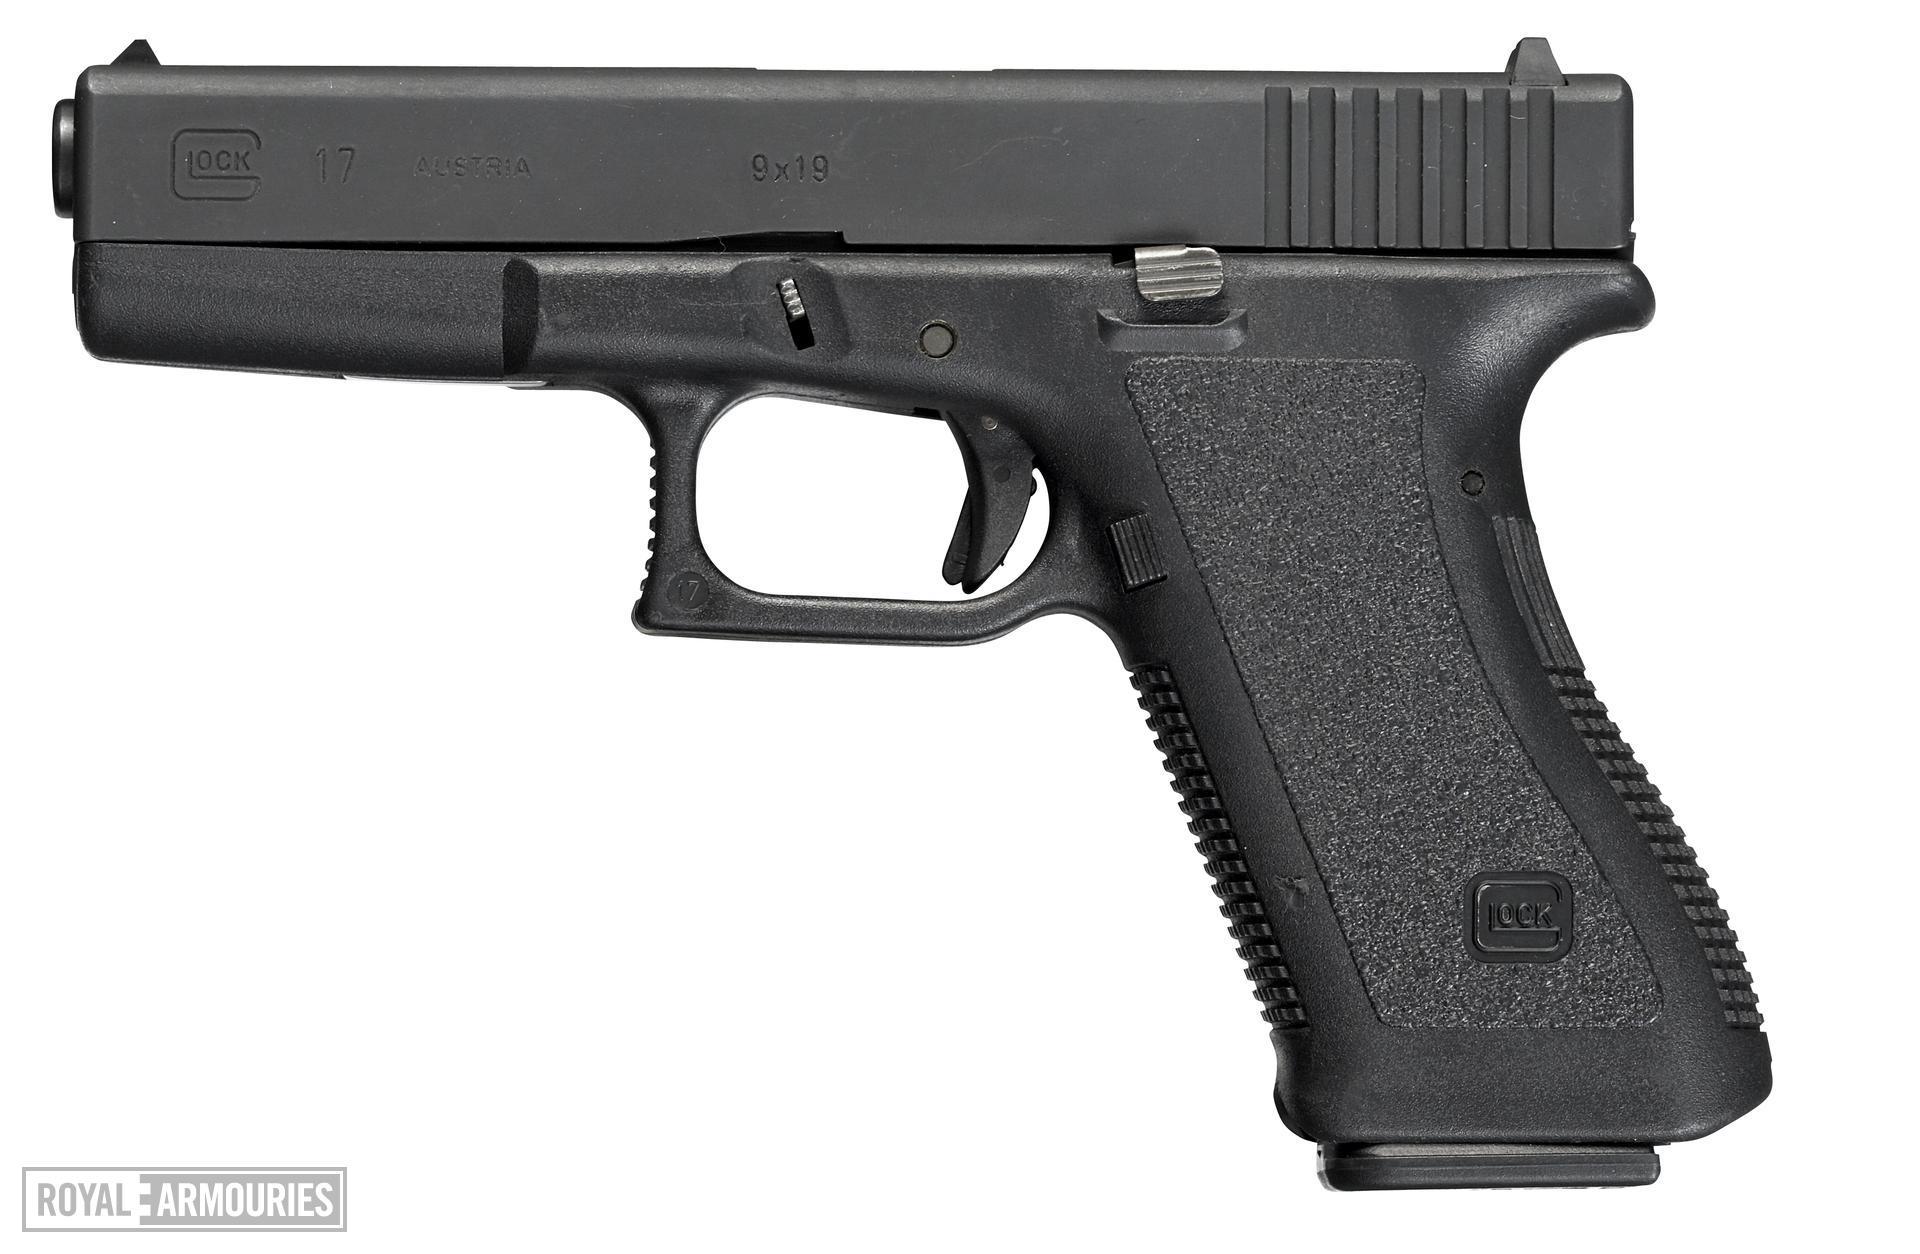 Centrefire self-loading pistol - Glock 17